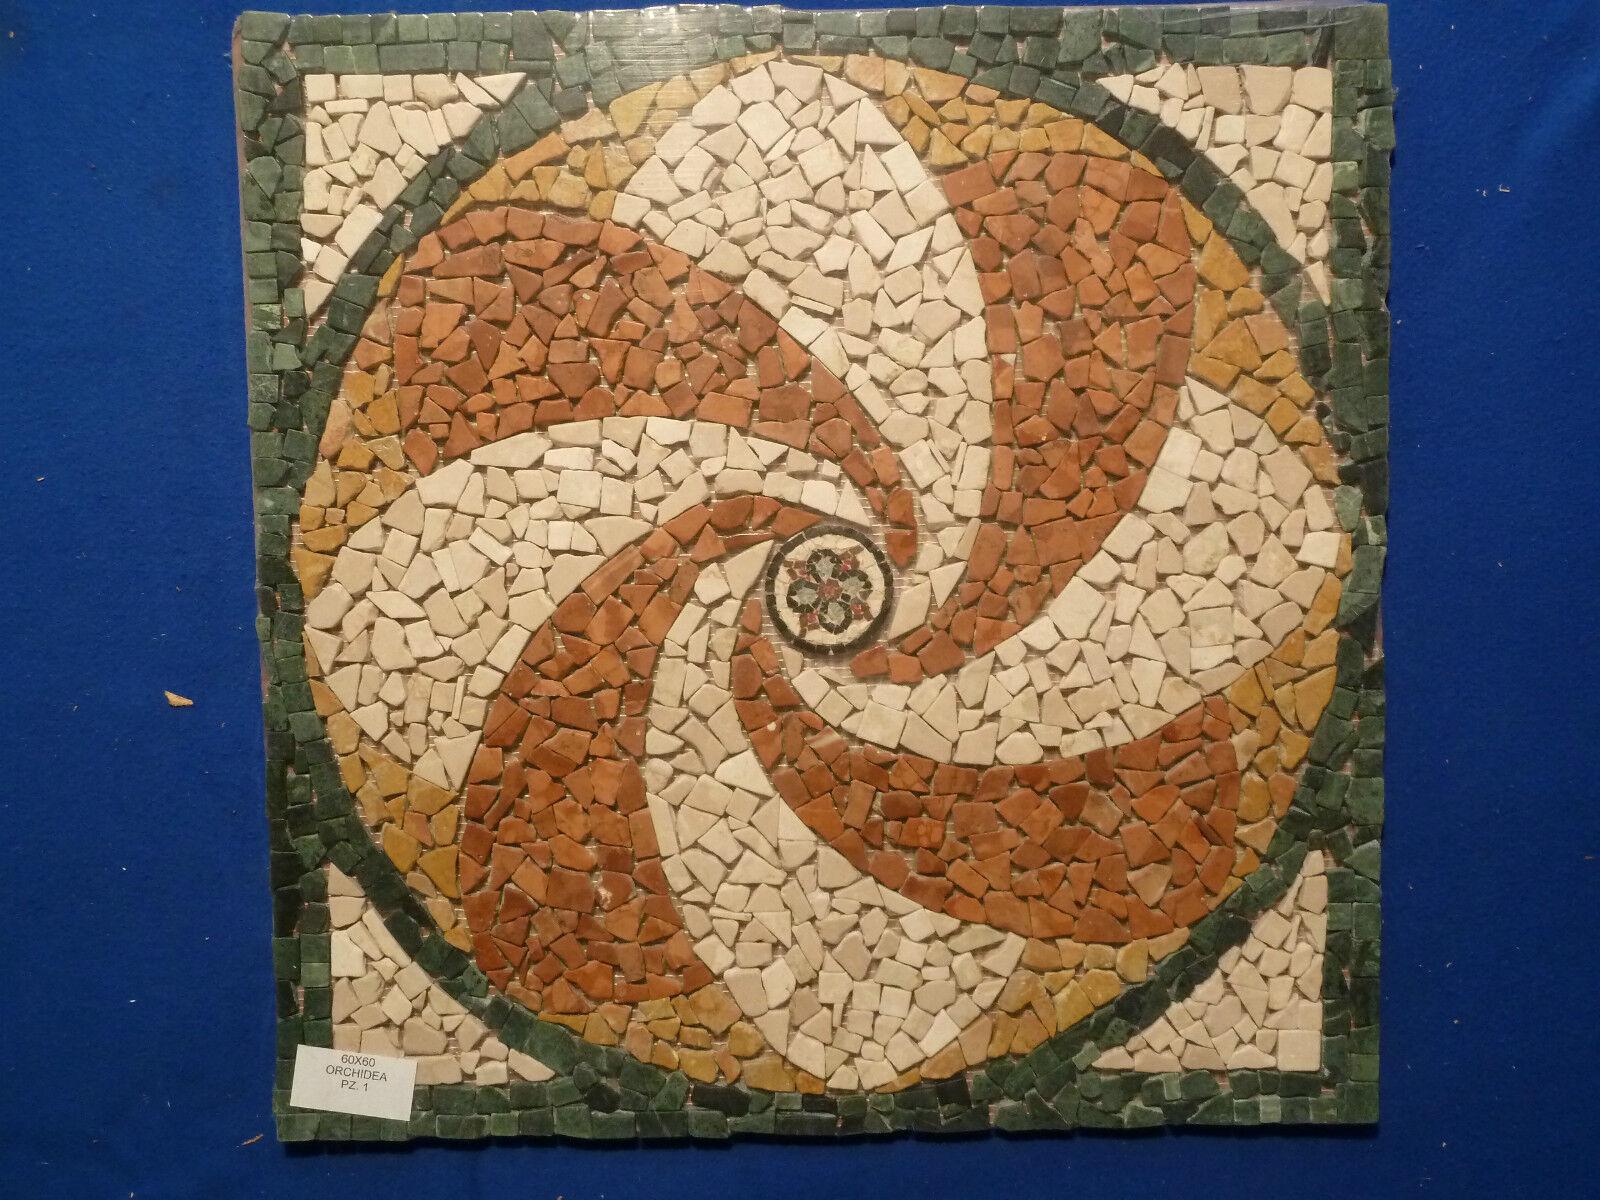 Naturstein Rosone, Antik Marmor, Fliese, Mosaik R119 Expressversand